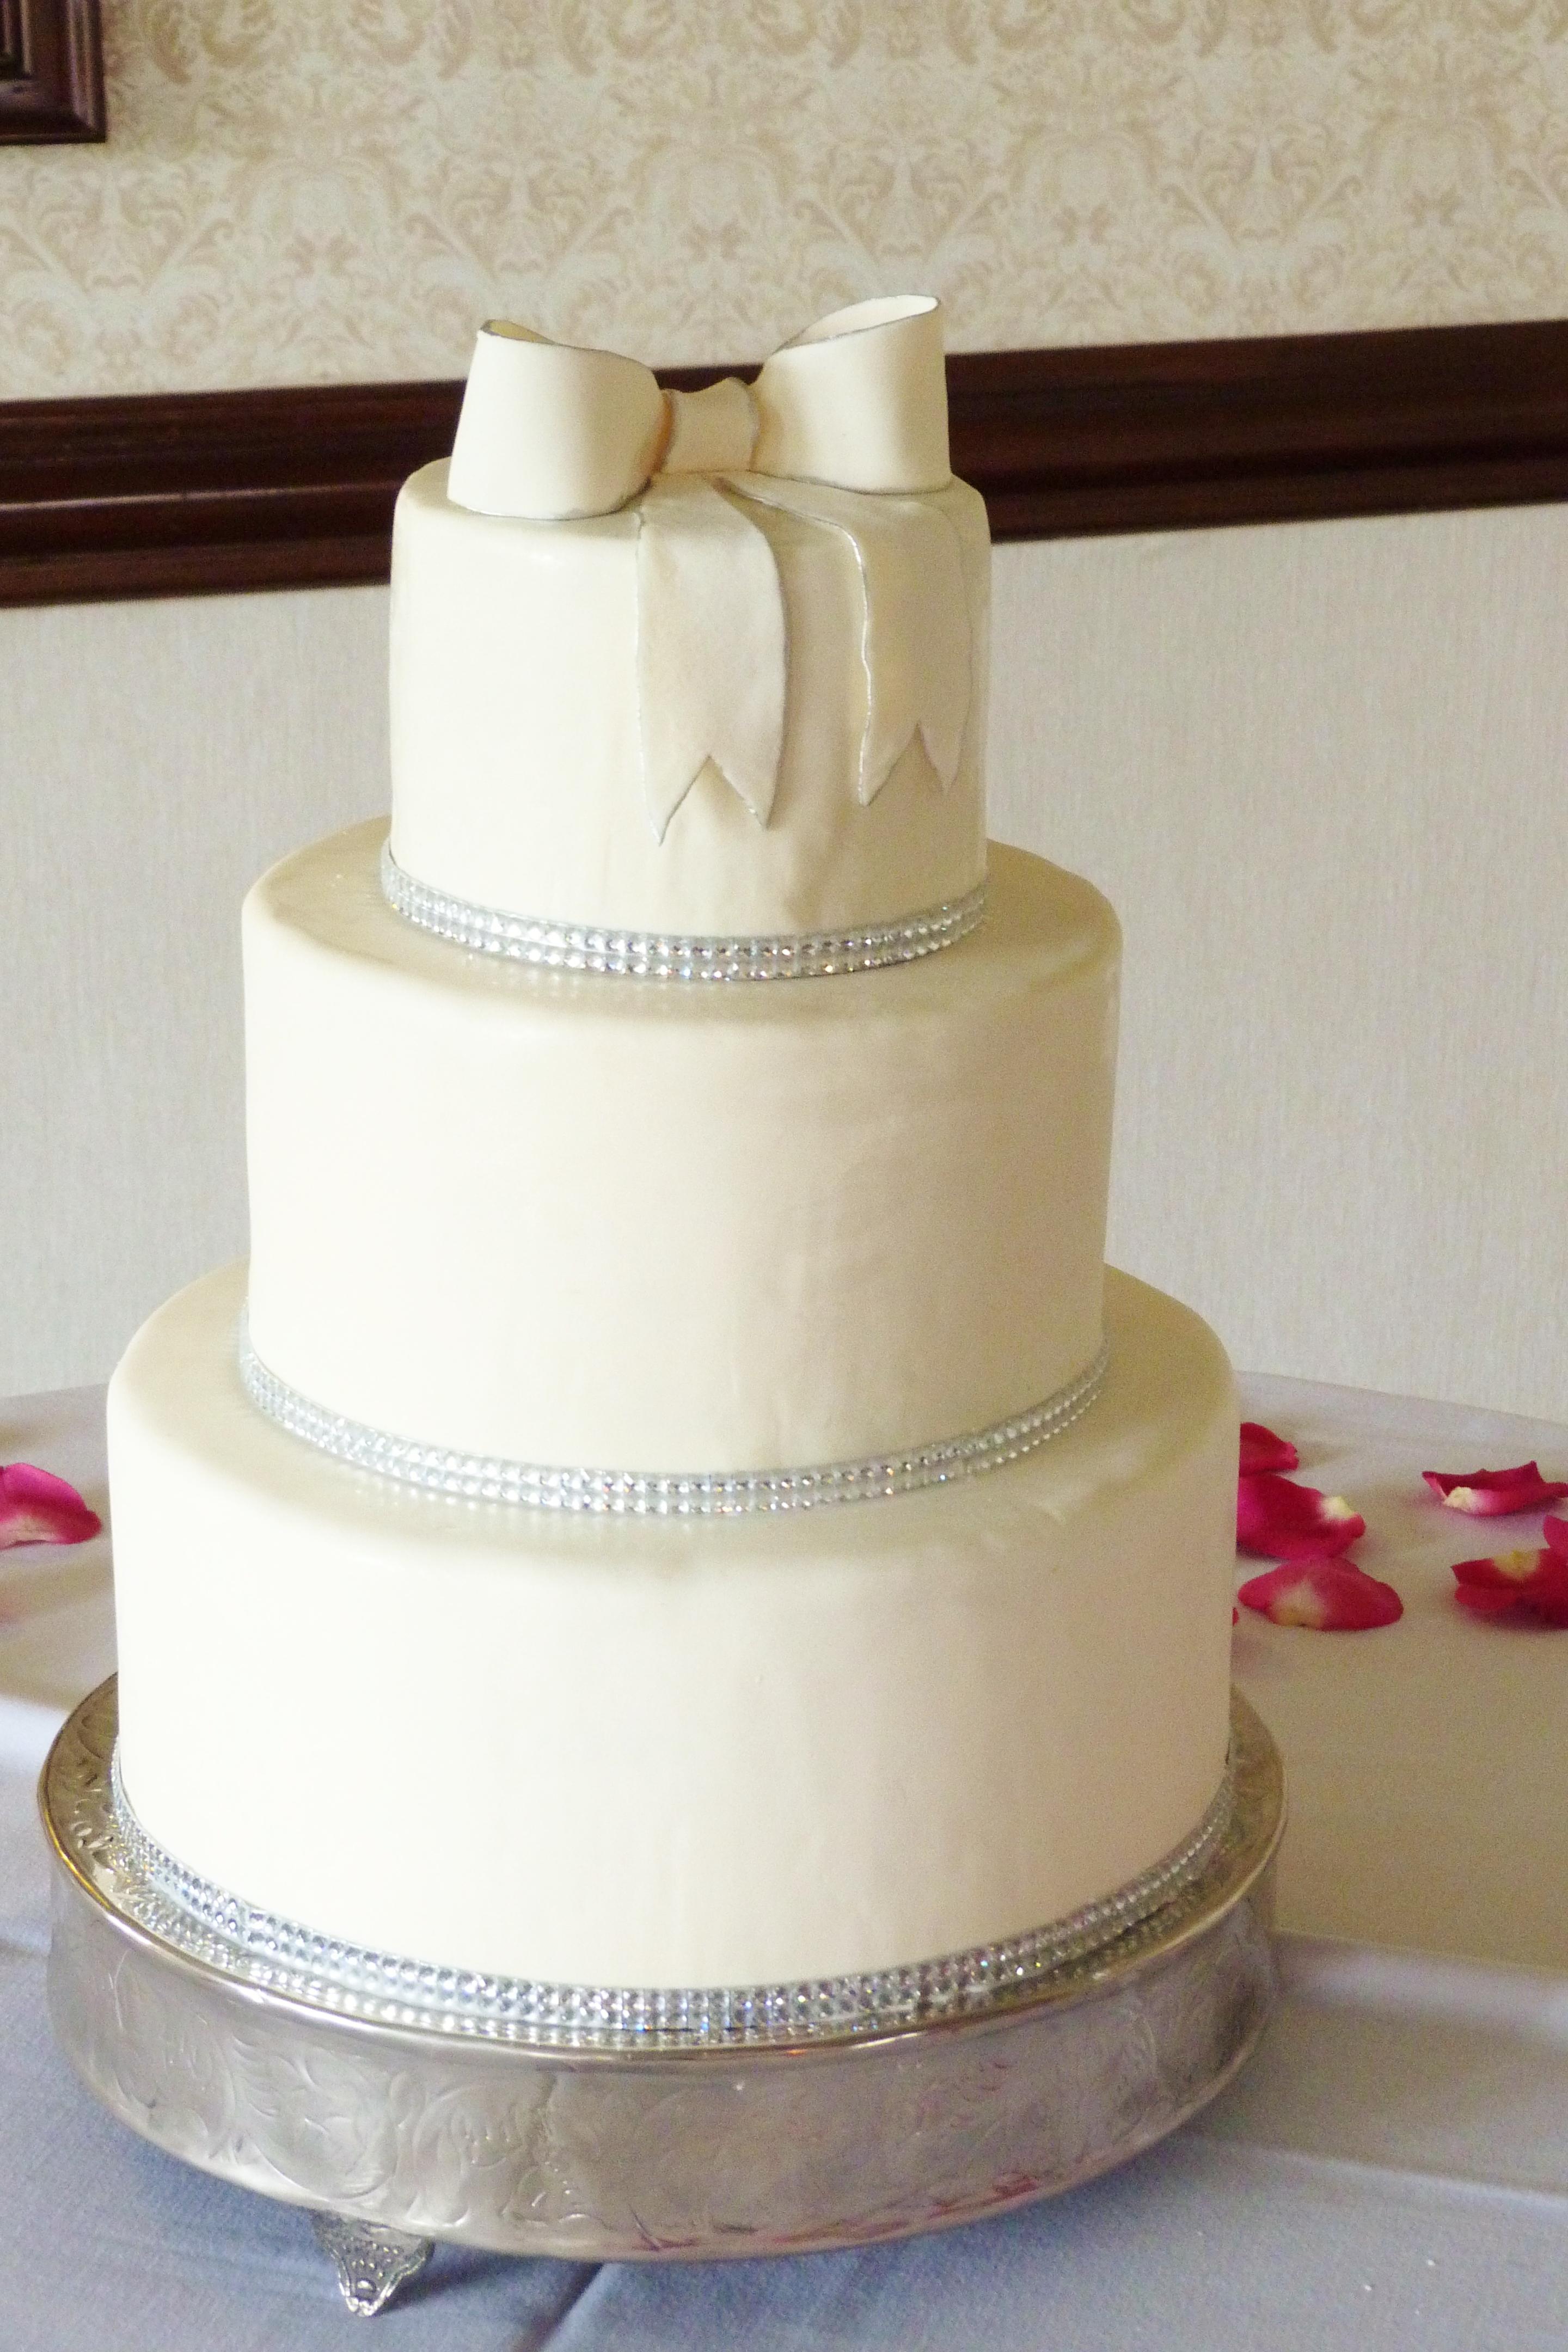 Elegant Round Wedding Cake With Fondant Silver Trim And